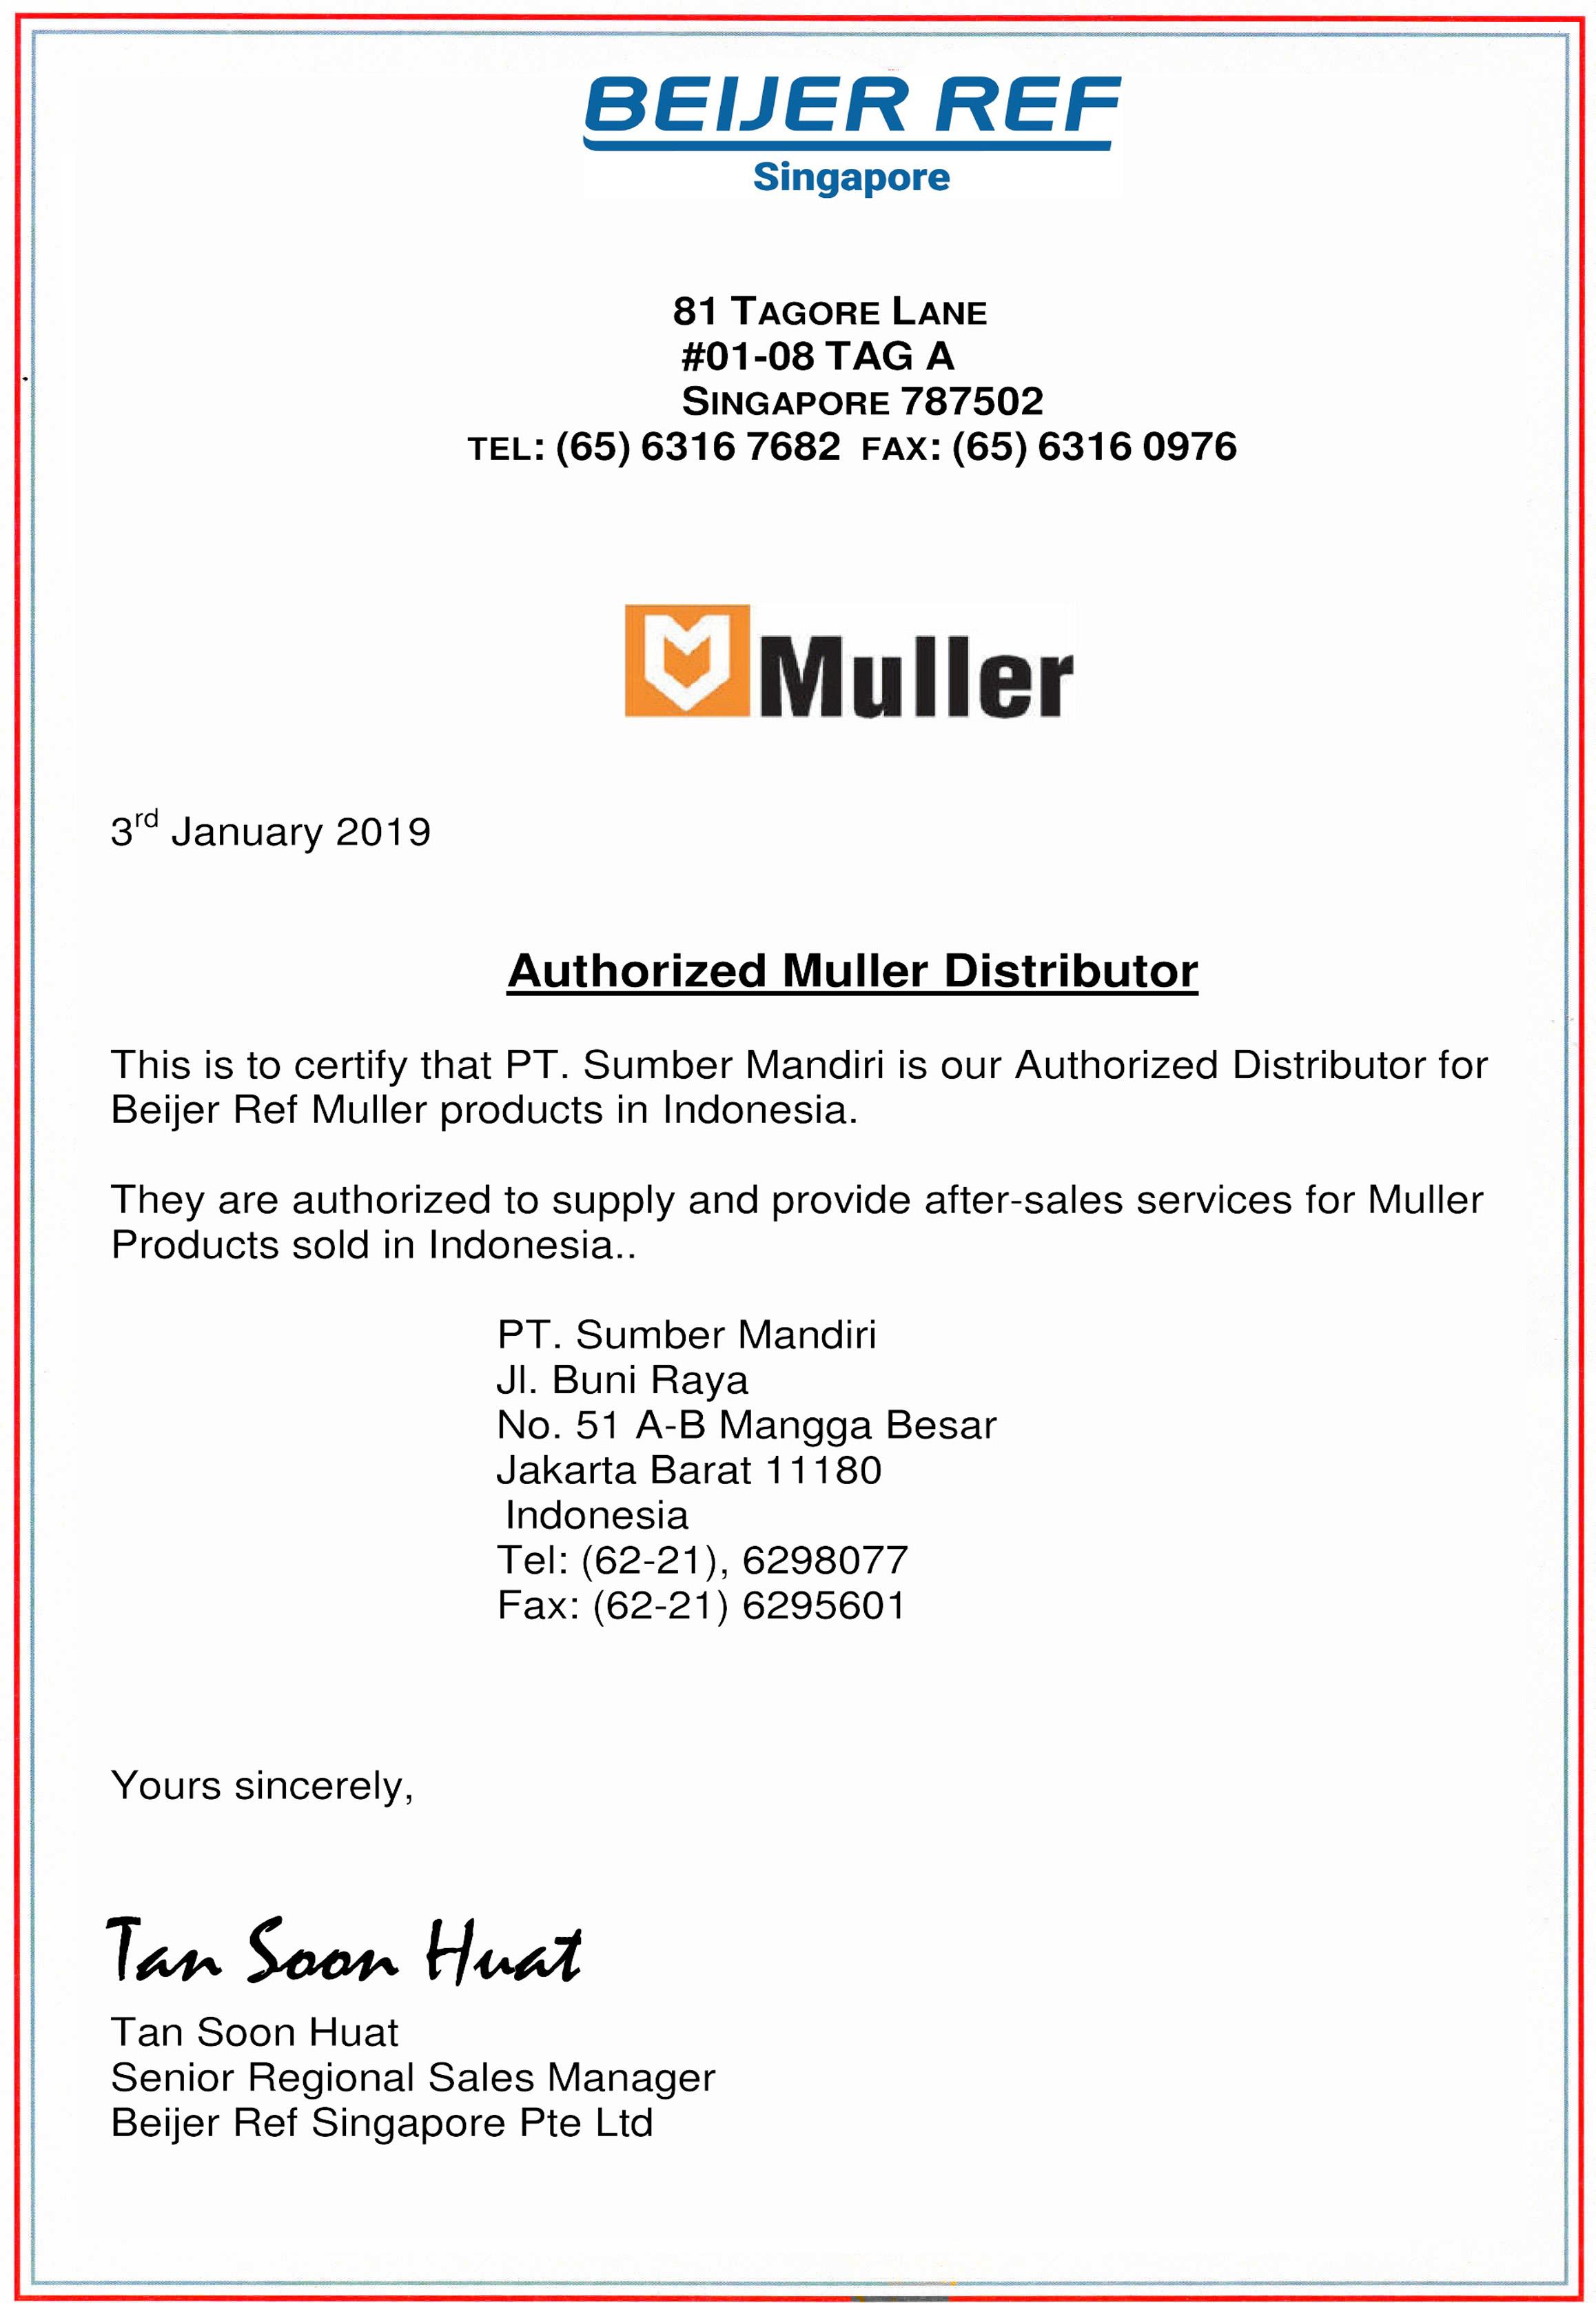 Auth Distrib Cert-PT Sumber  Mandiri_MULLER.jpg